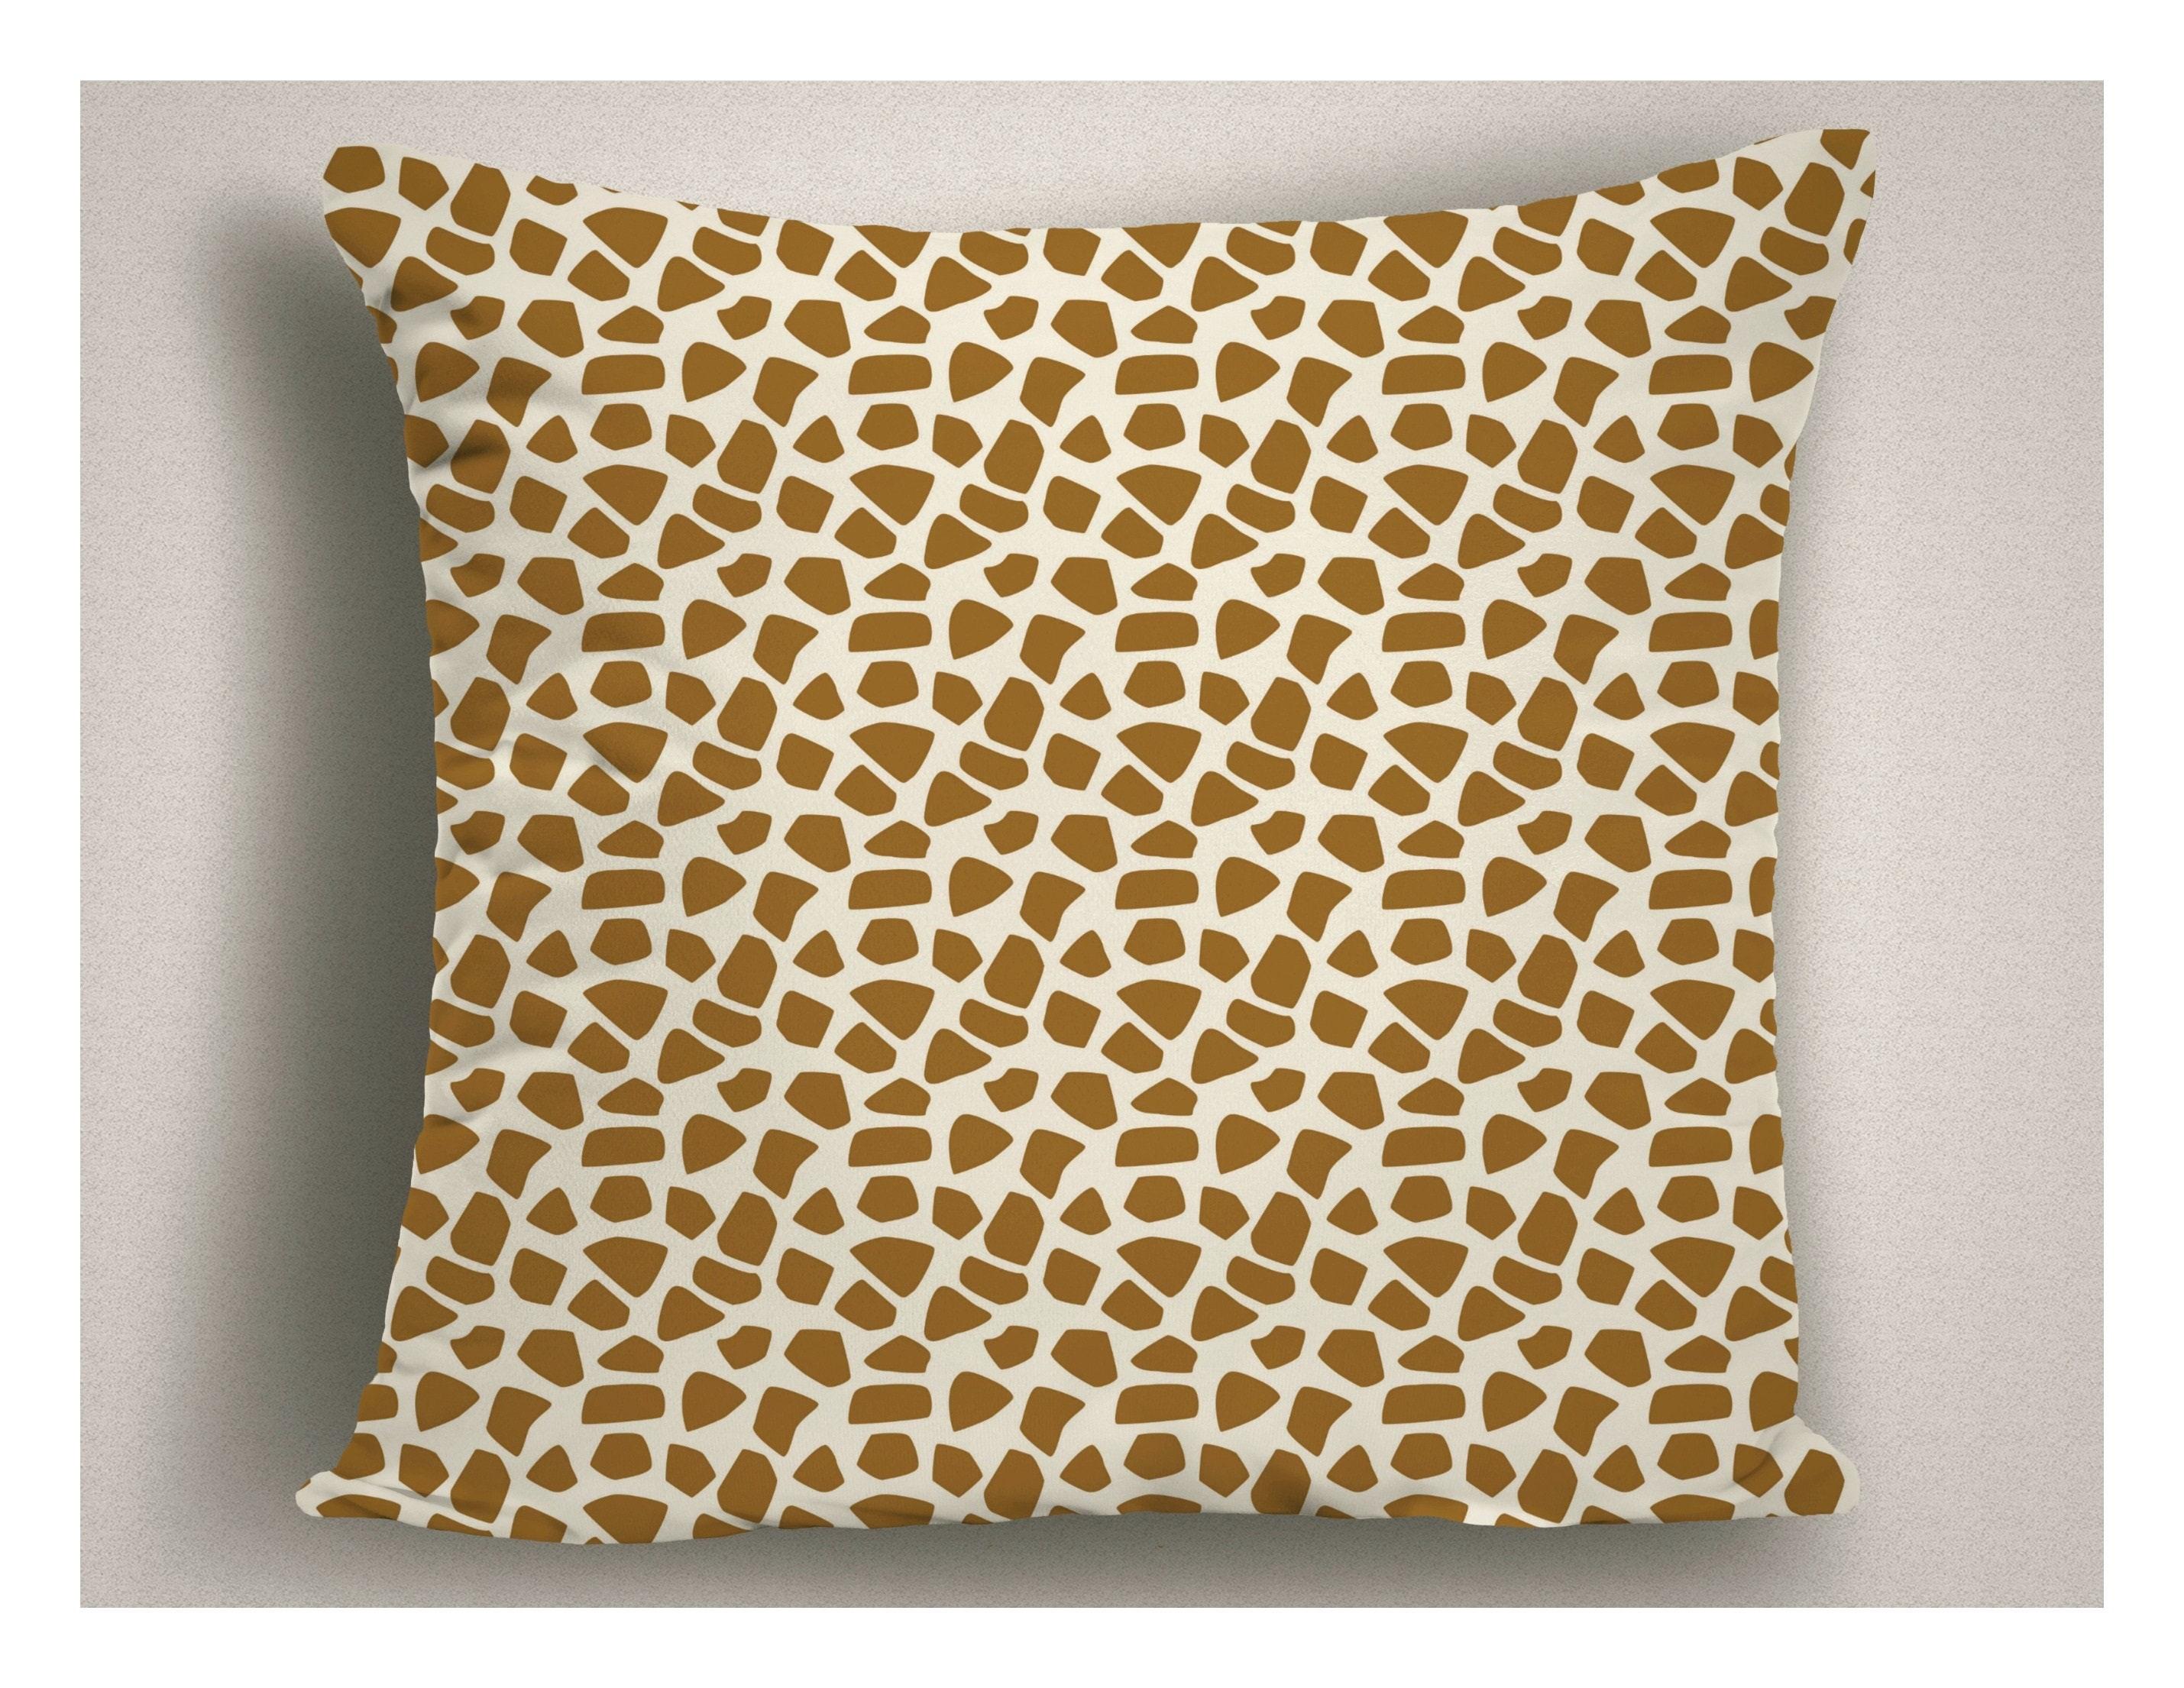 Unique Giraffe Print Throw Pillow Animal Print Pillow African Decor